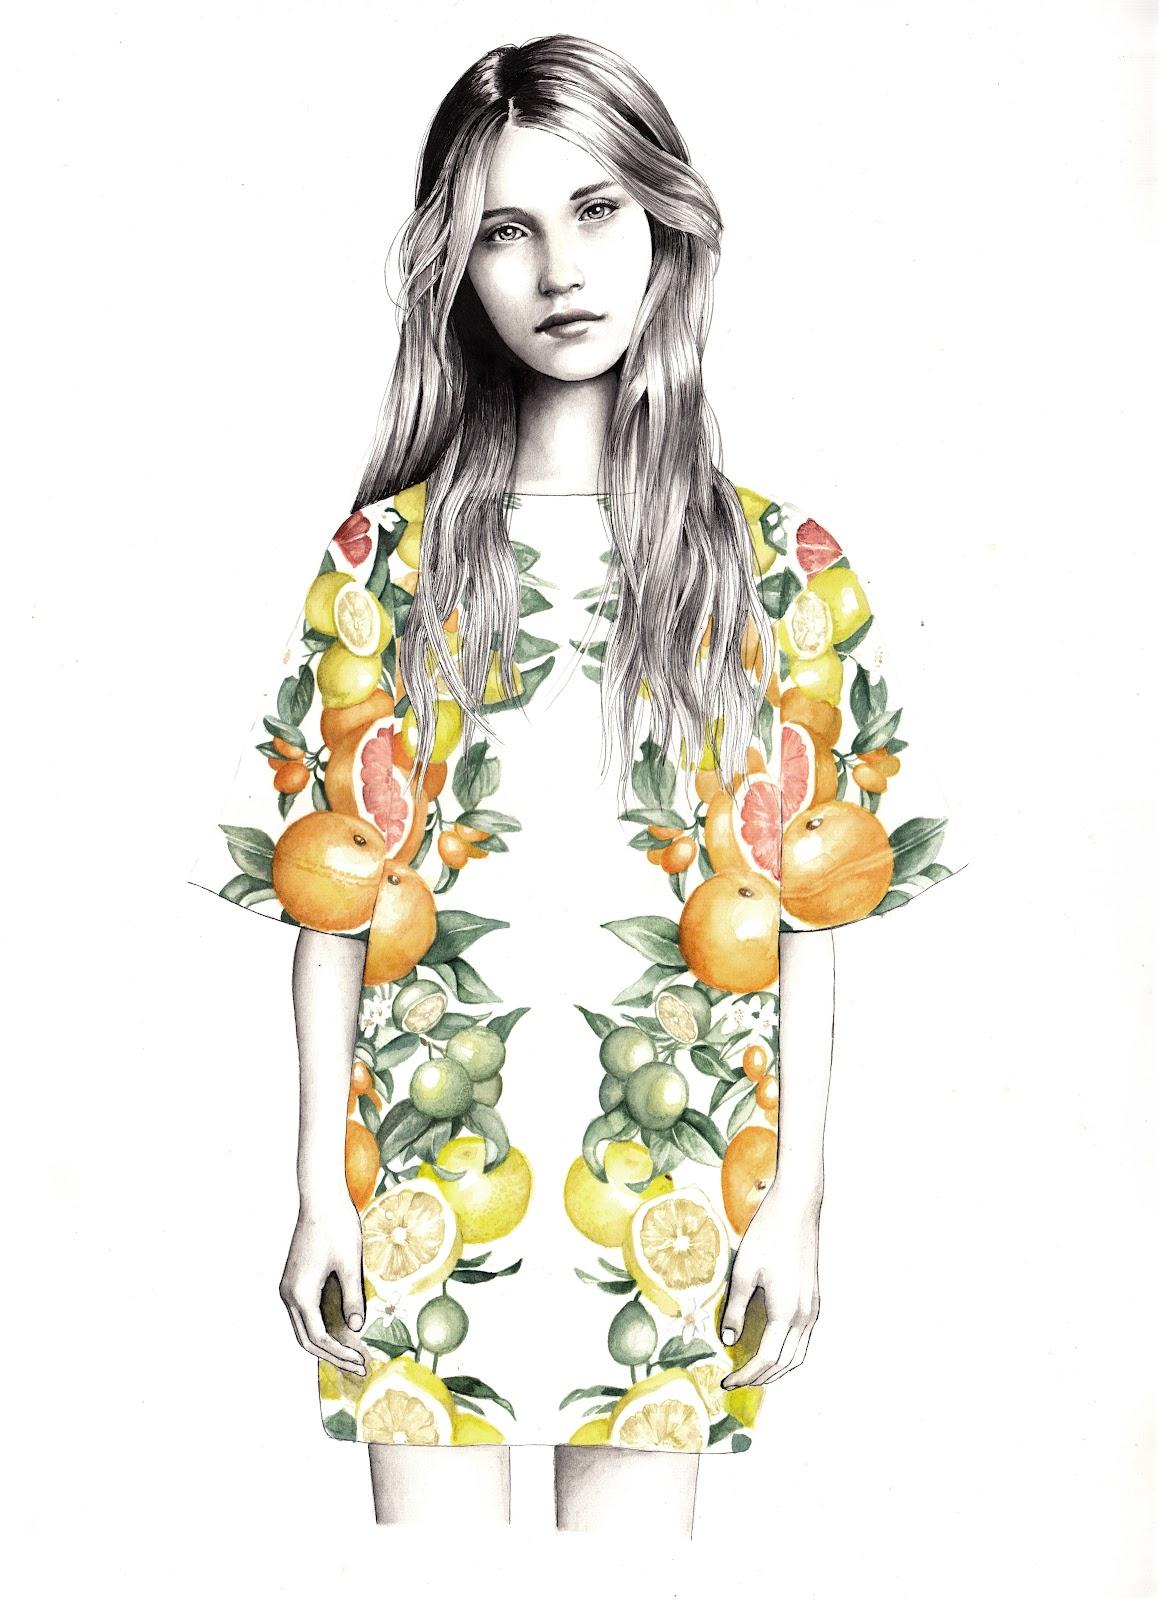 Hannah muller fashion illustrator